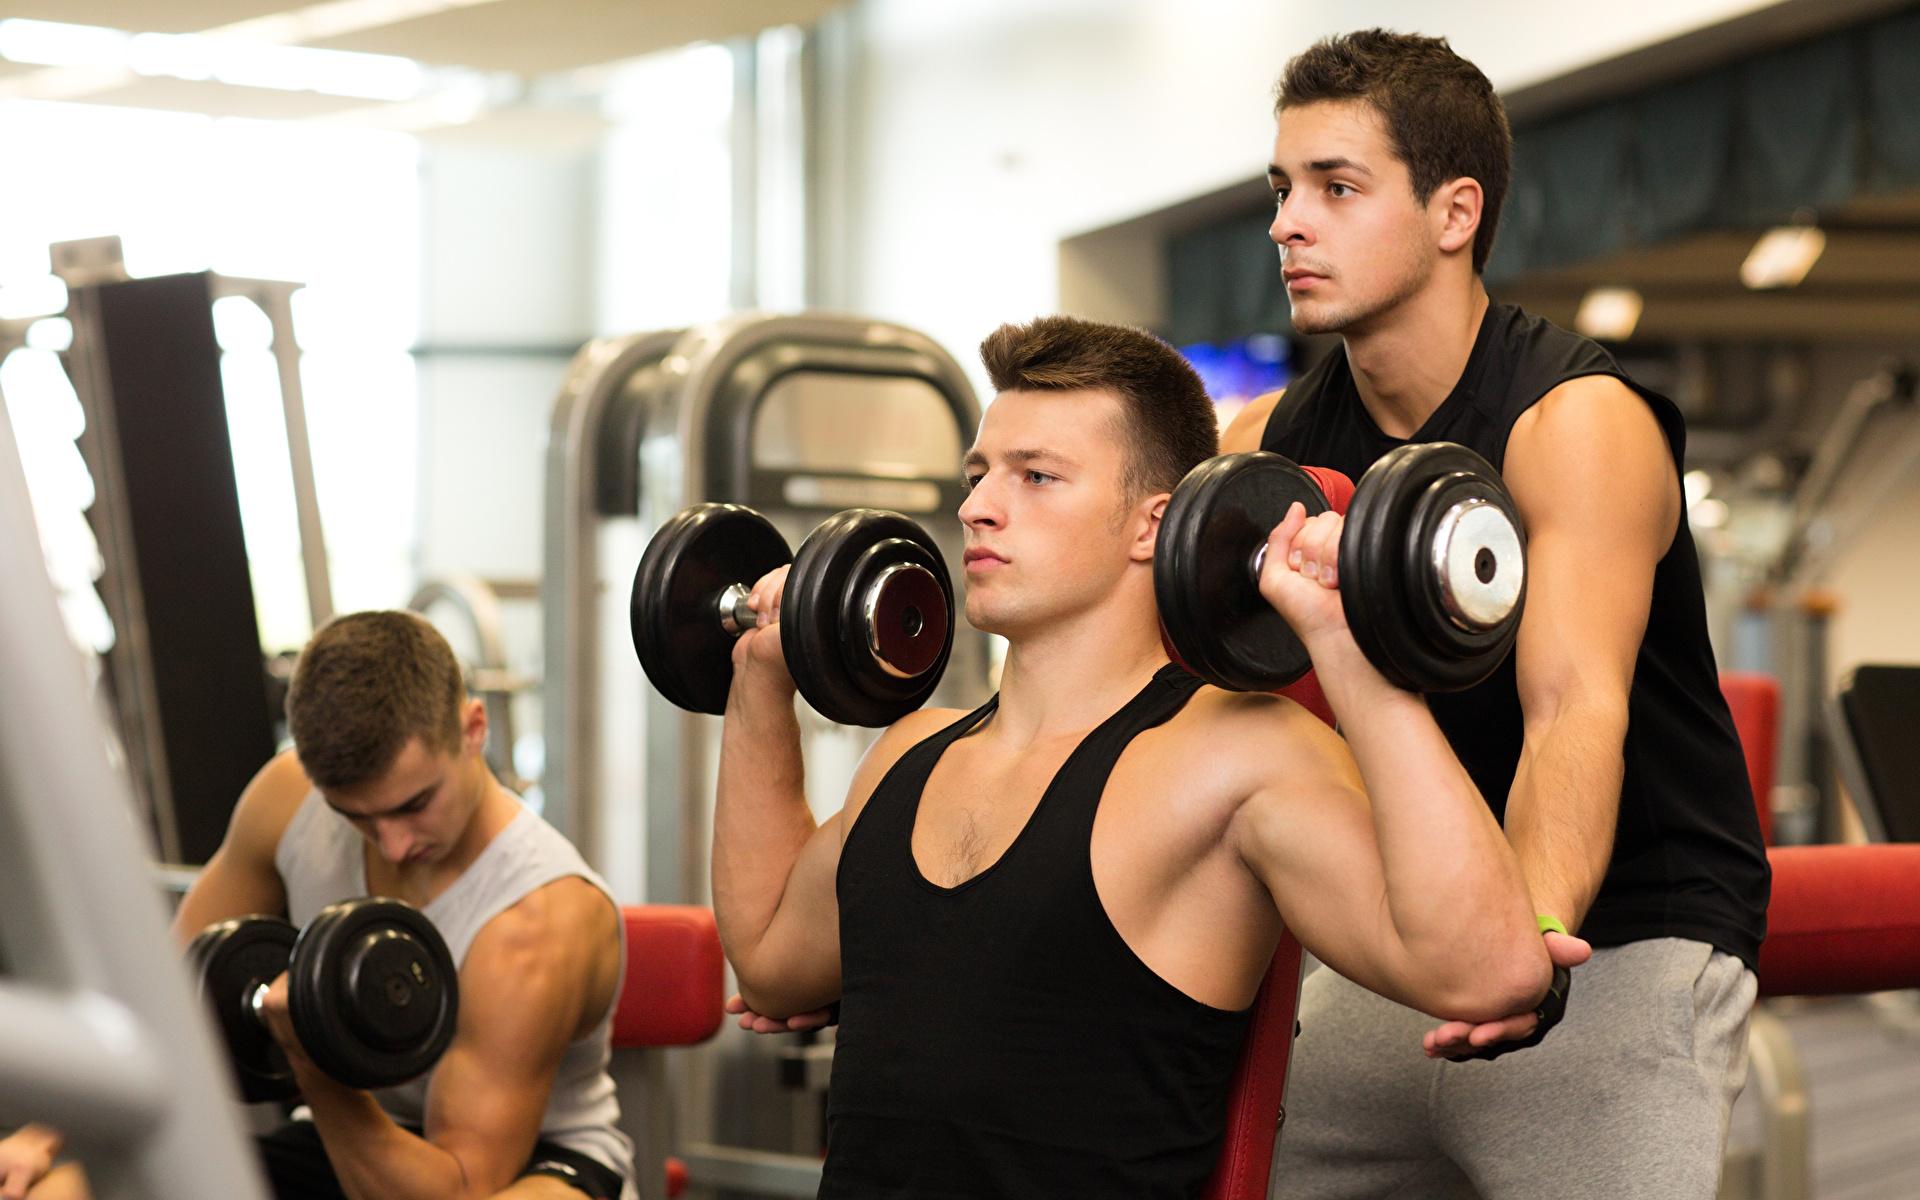 Спорт для новичков. возможен ли бодибилдинг дома?